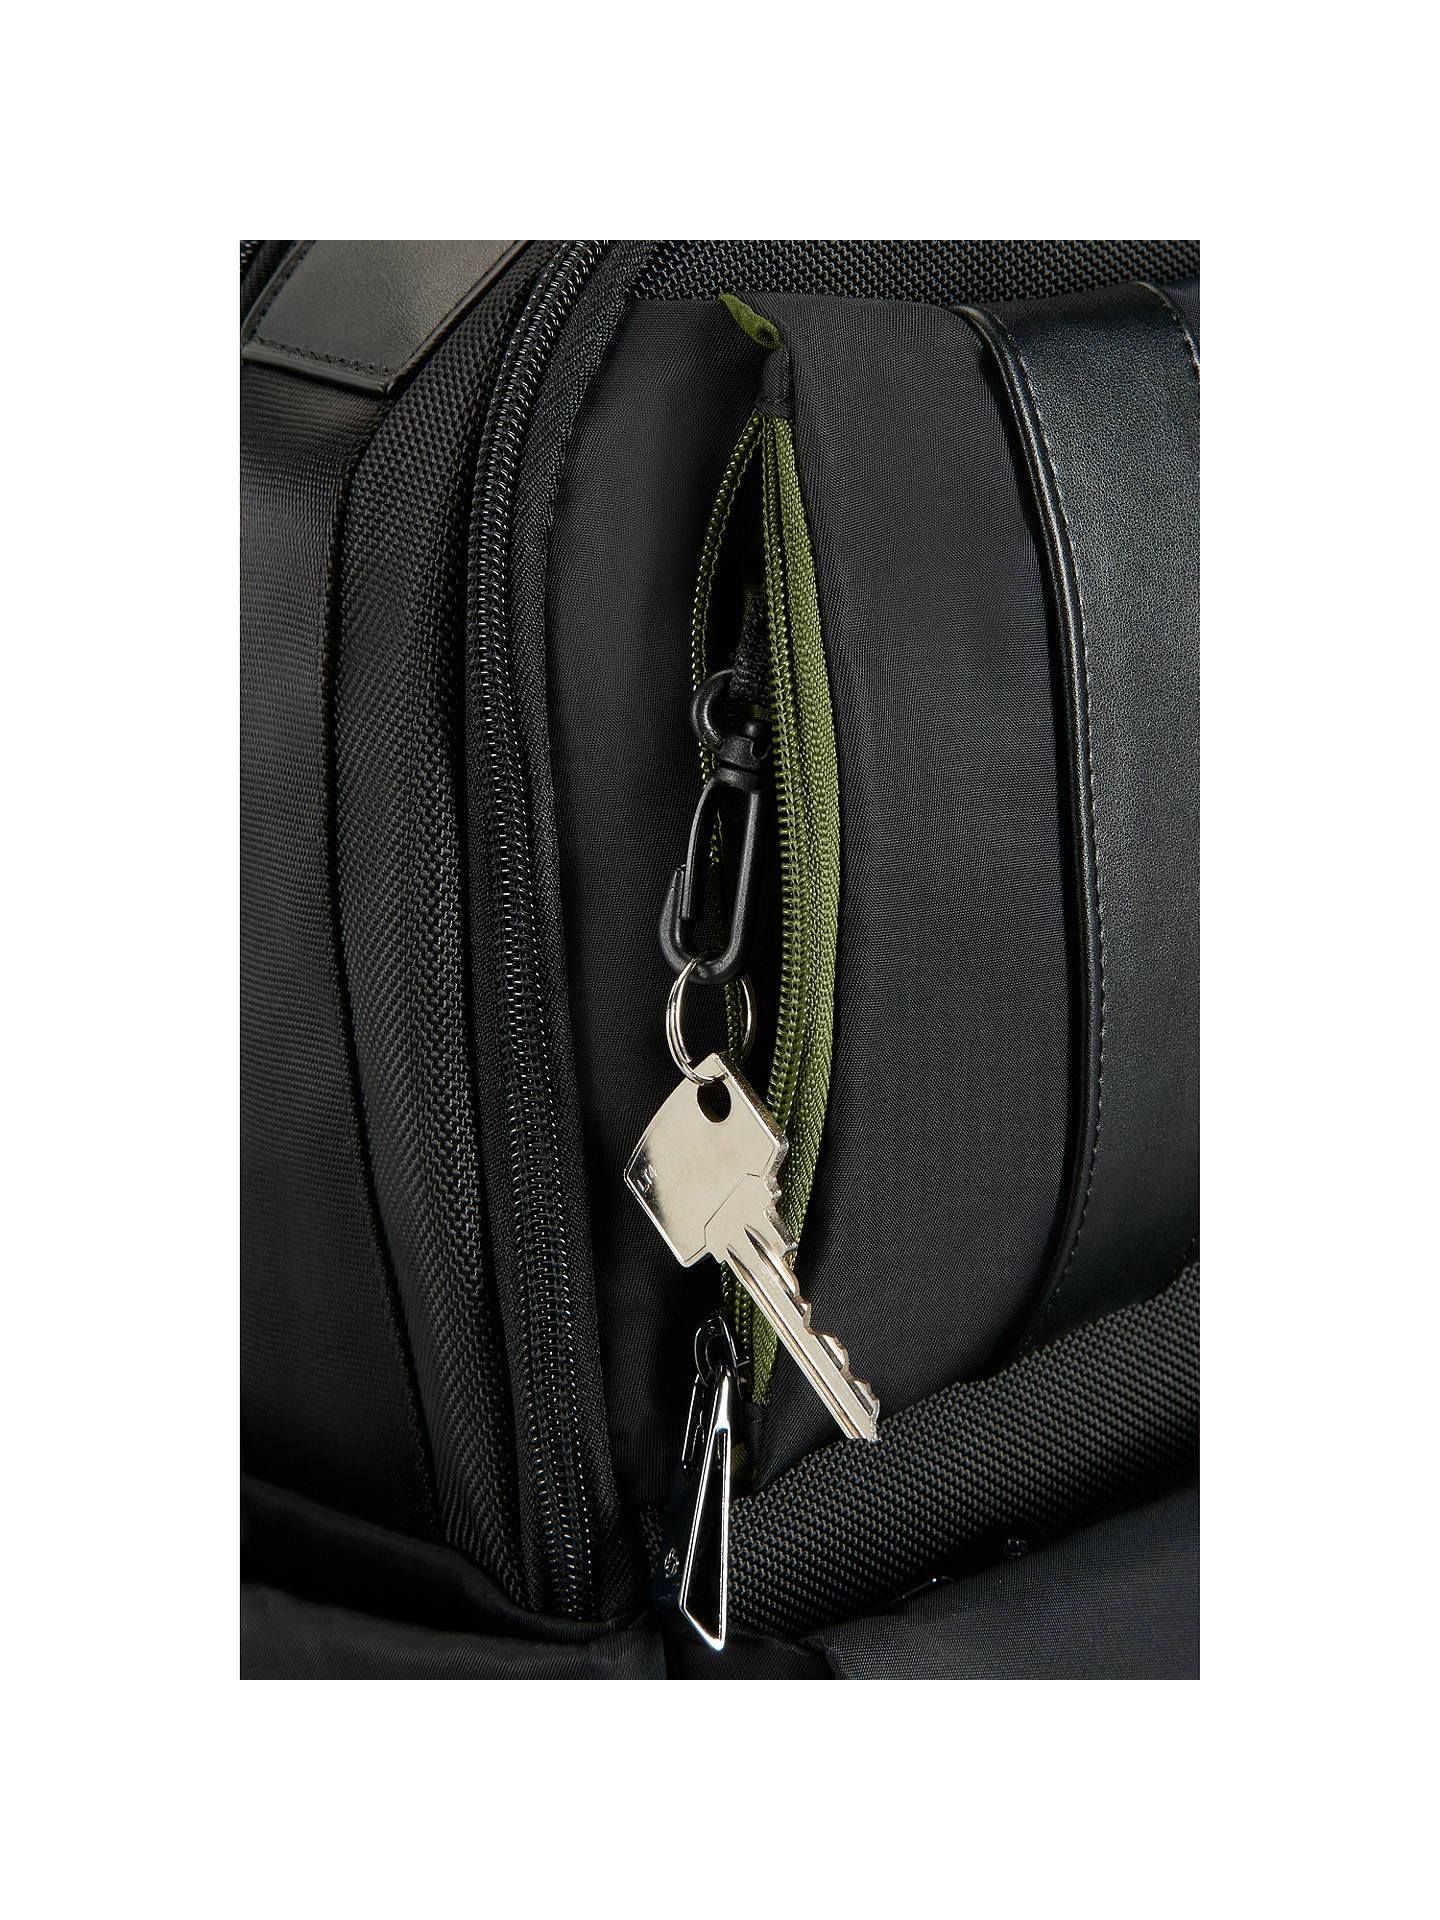 426d5d18214 ... BuySamsonite OpenRoad Laptop Backpack 15.6